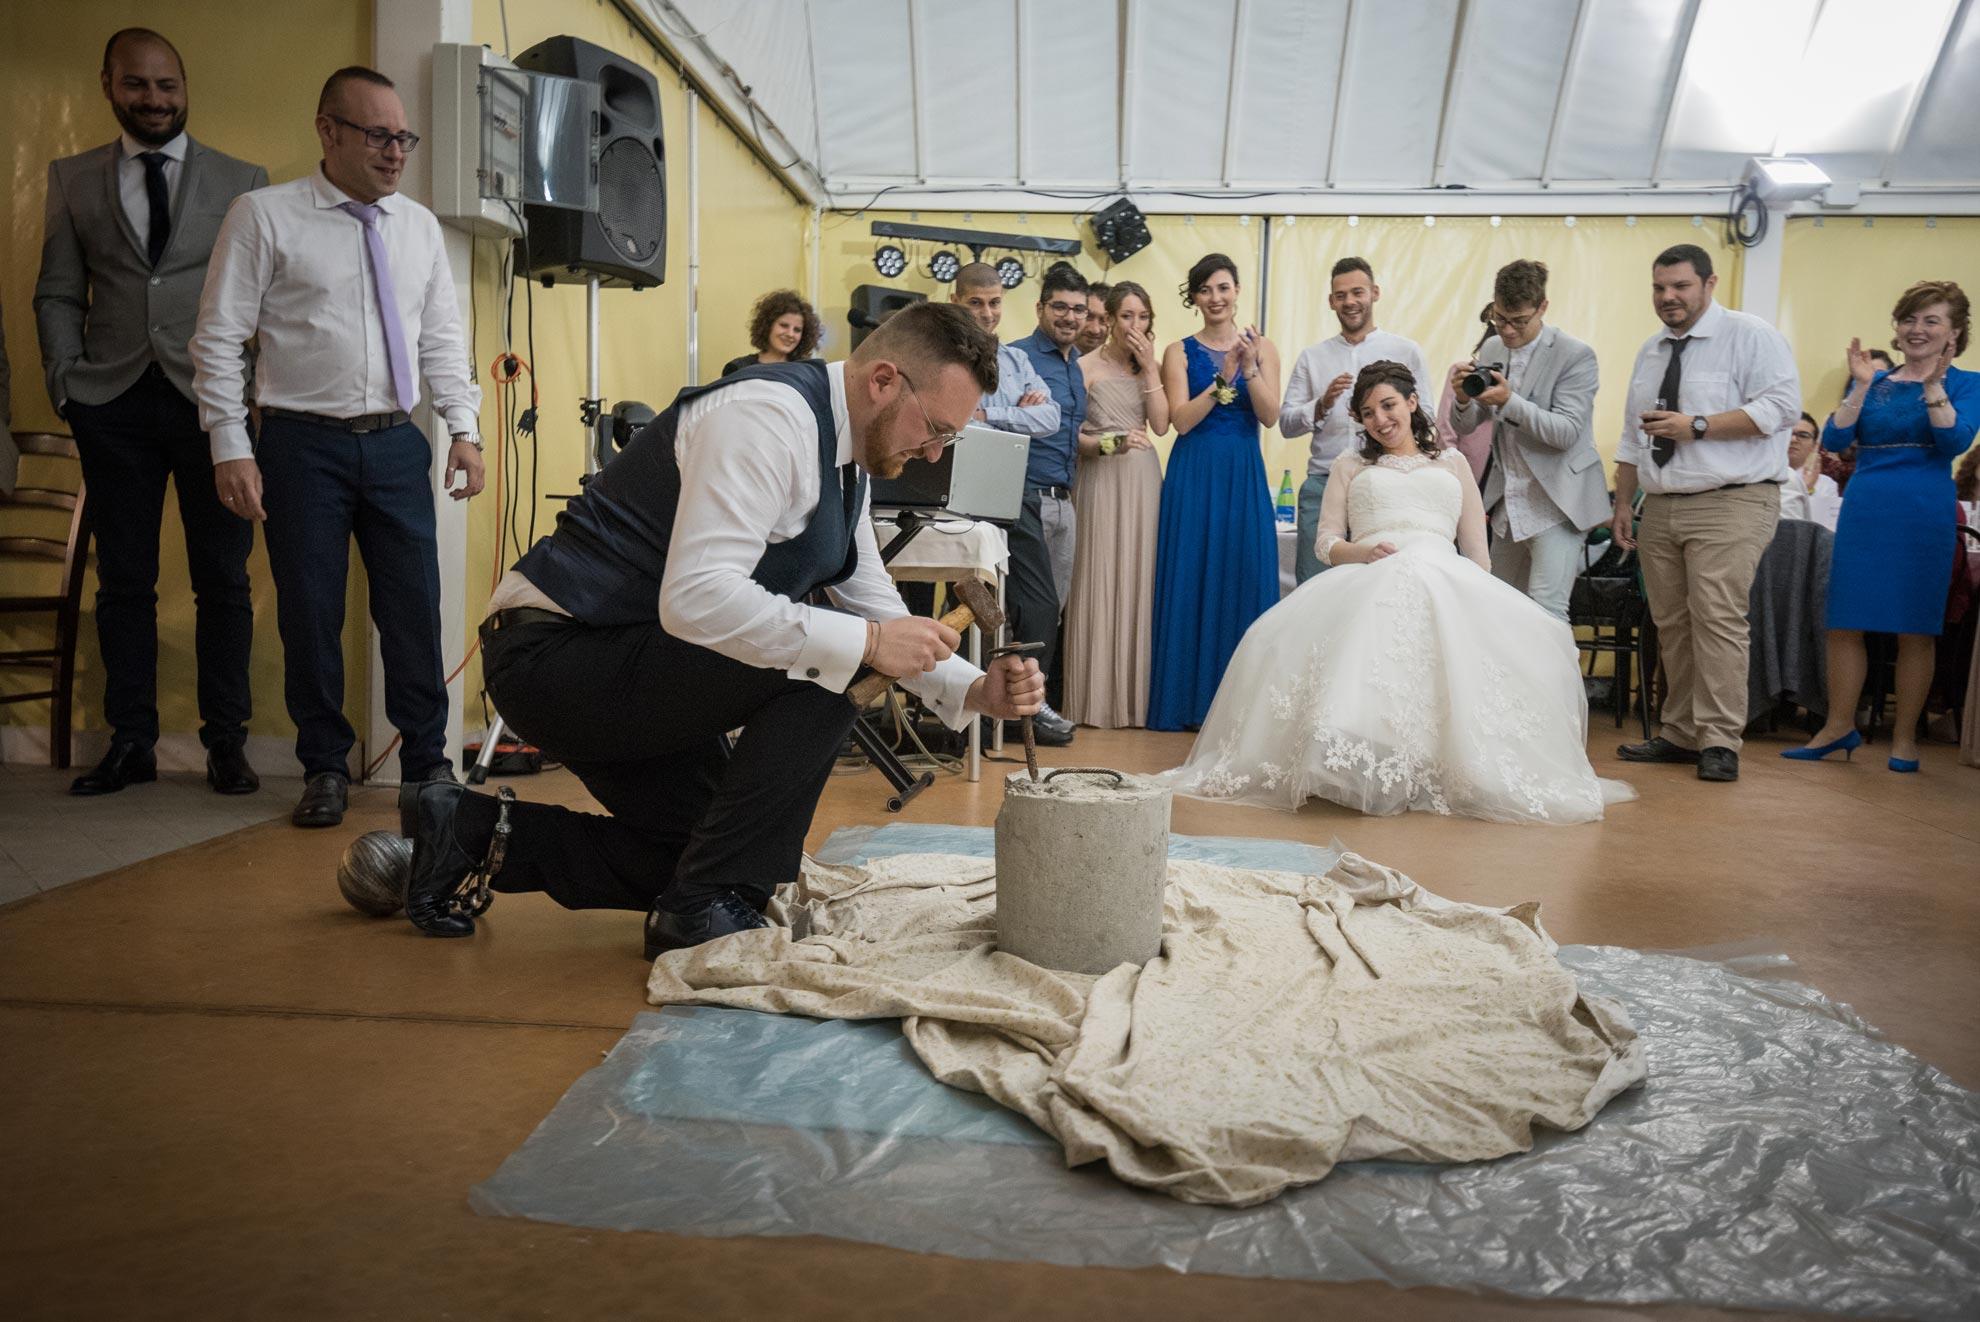 Matrimonio a Narzole Lorenza Diego - DSC 0825 - Fotografie sposo matrimonio scherzi - Fotografie sposo matrimonio scherzi